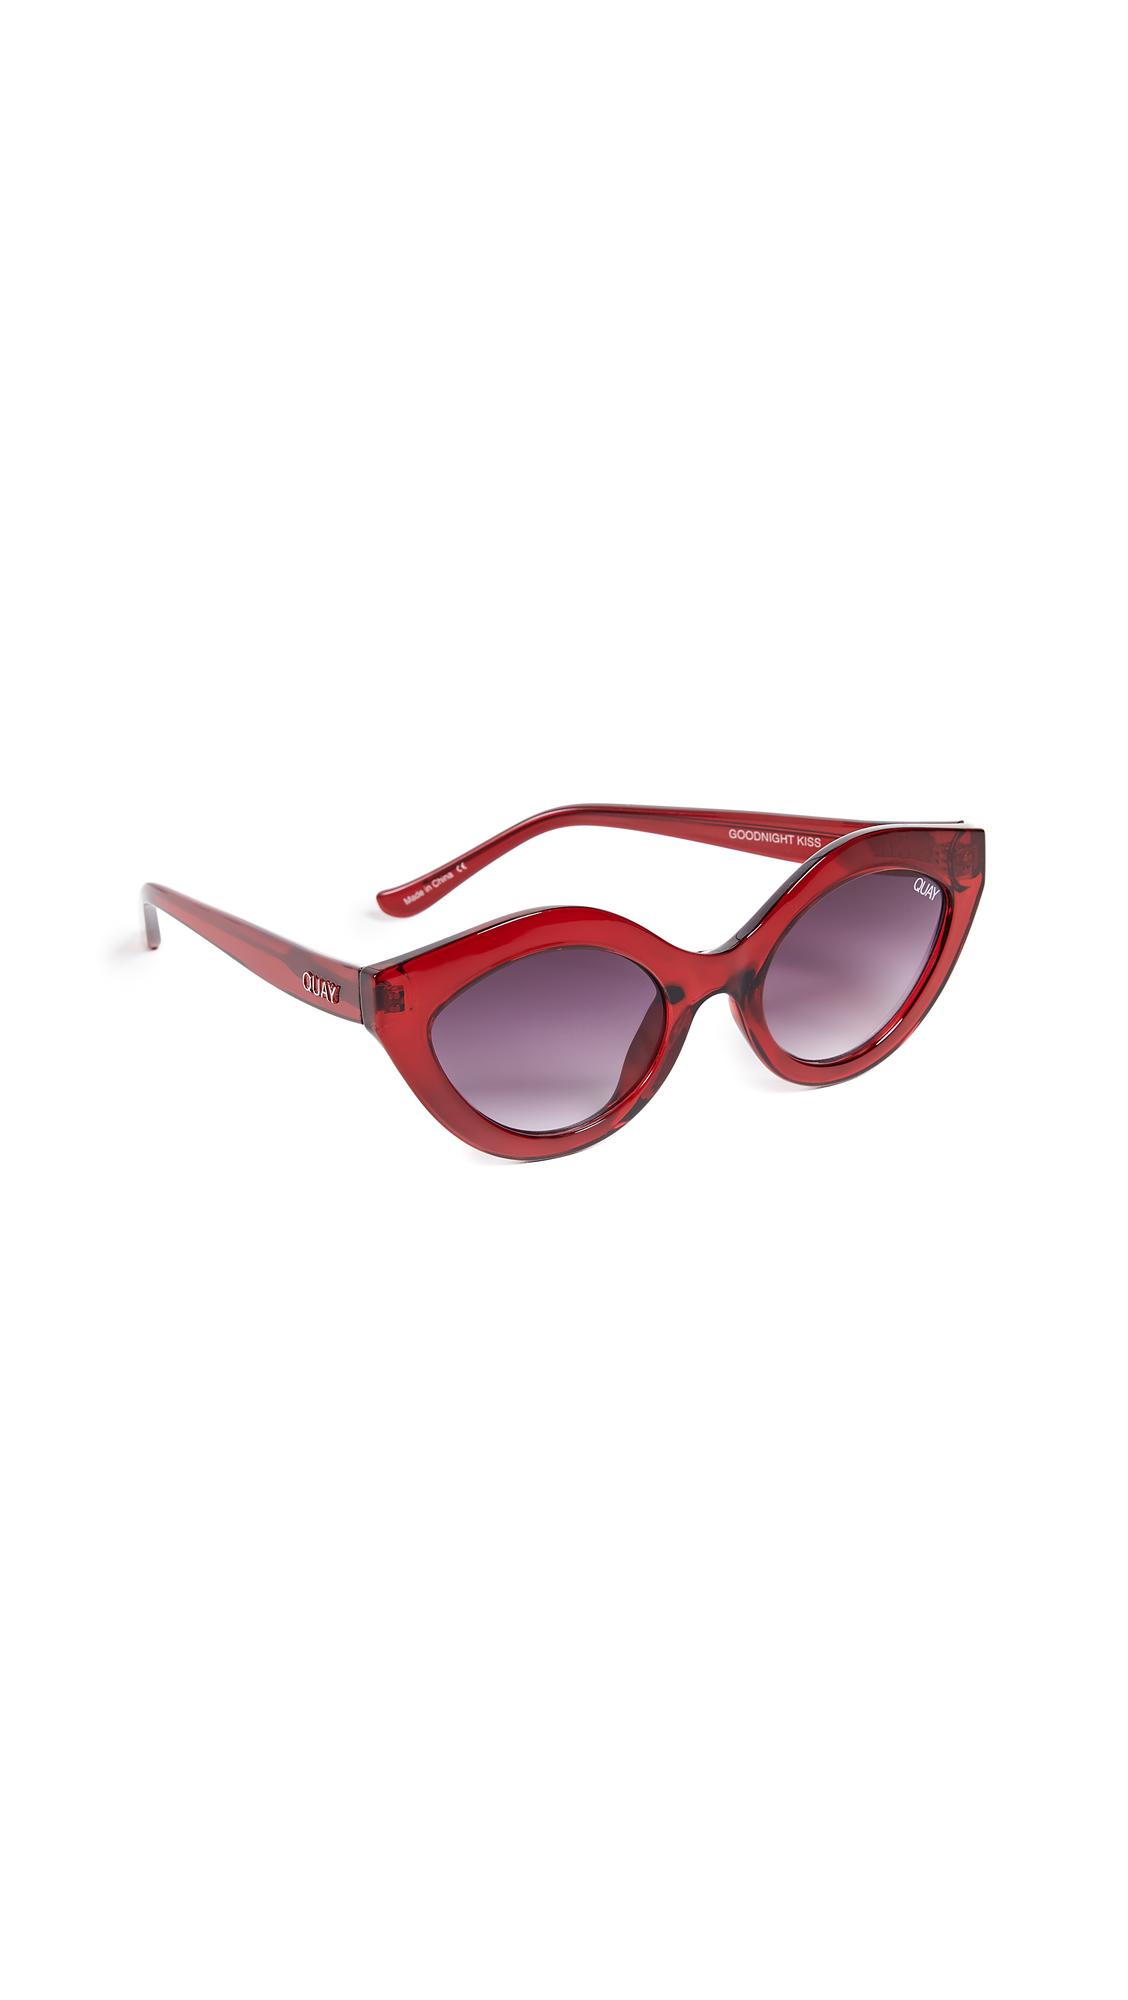 QUAY Goodnight Kiss Cat Eye Sunglasses - Red / Purple Fade in Red/Purple